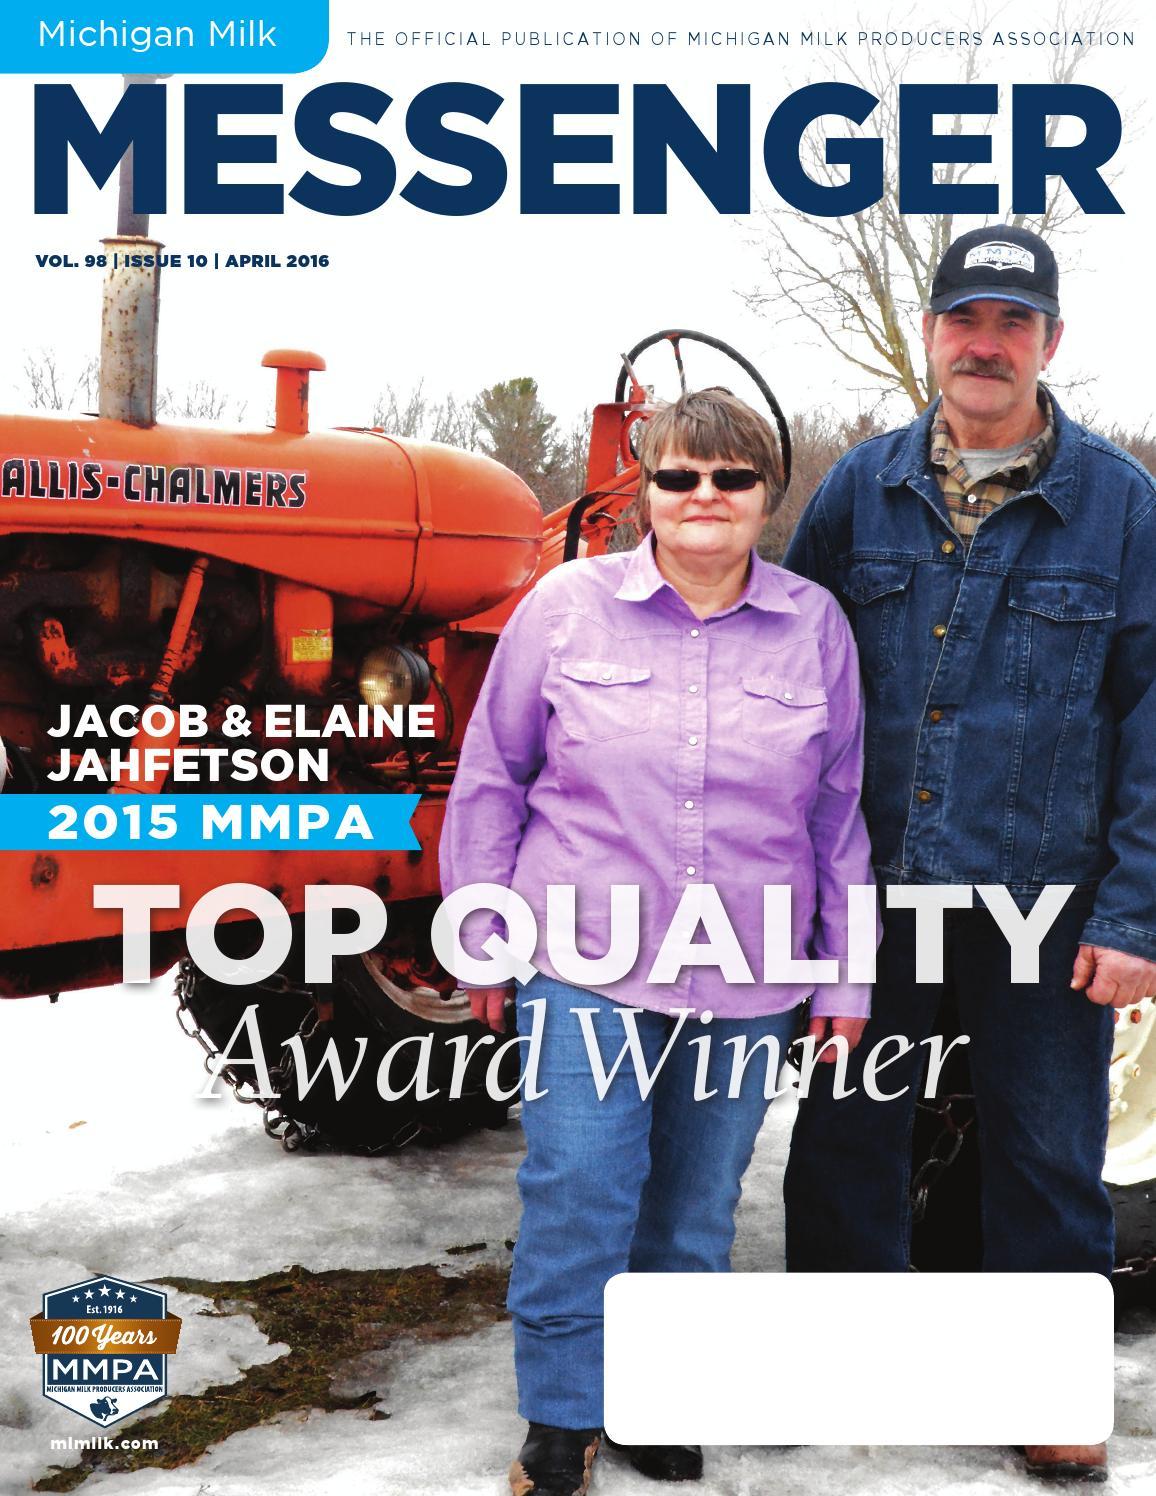 c4844cb63ab Michigan Milk Messenger  April 2016 by Michigan Milk Producers ...